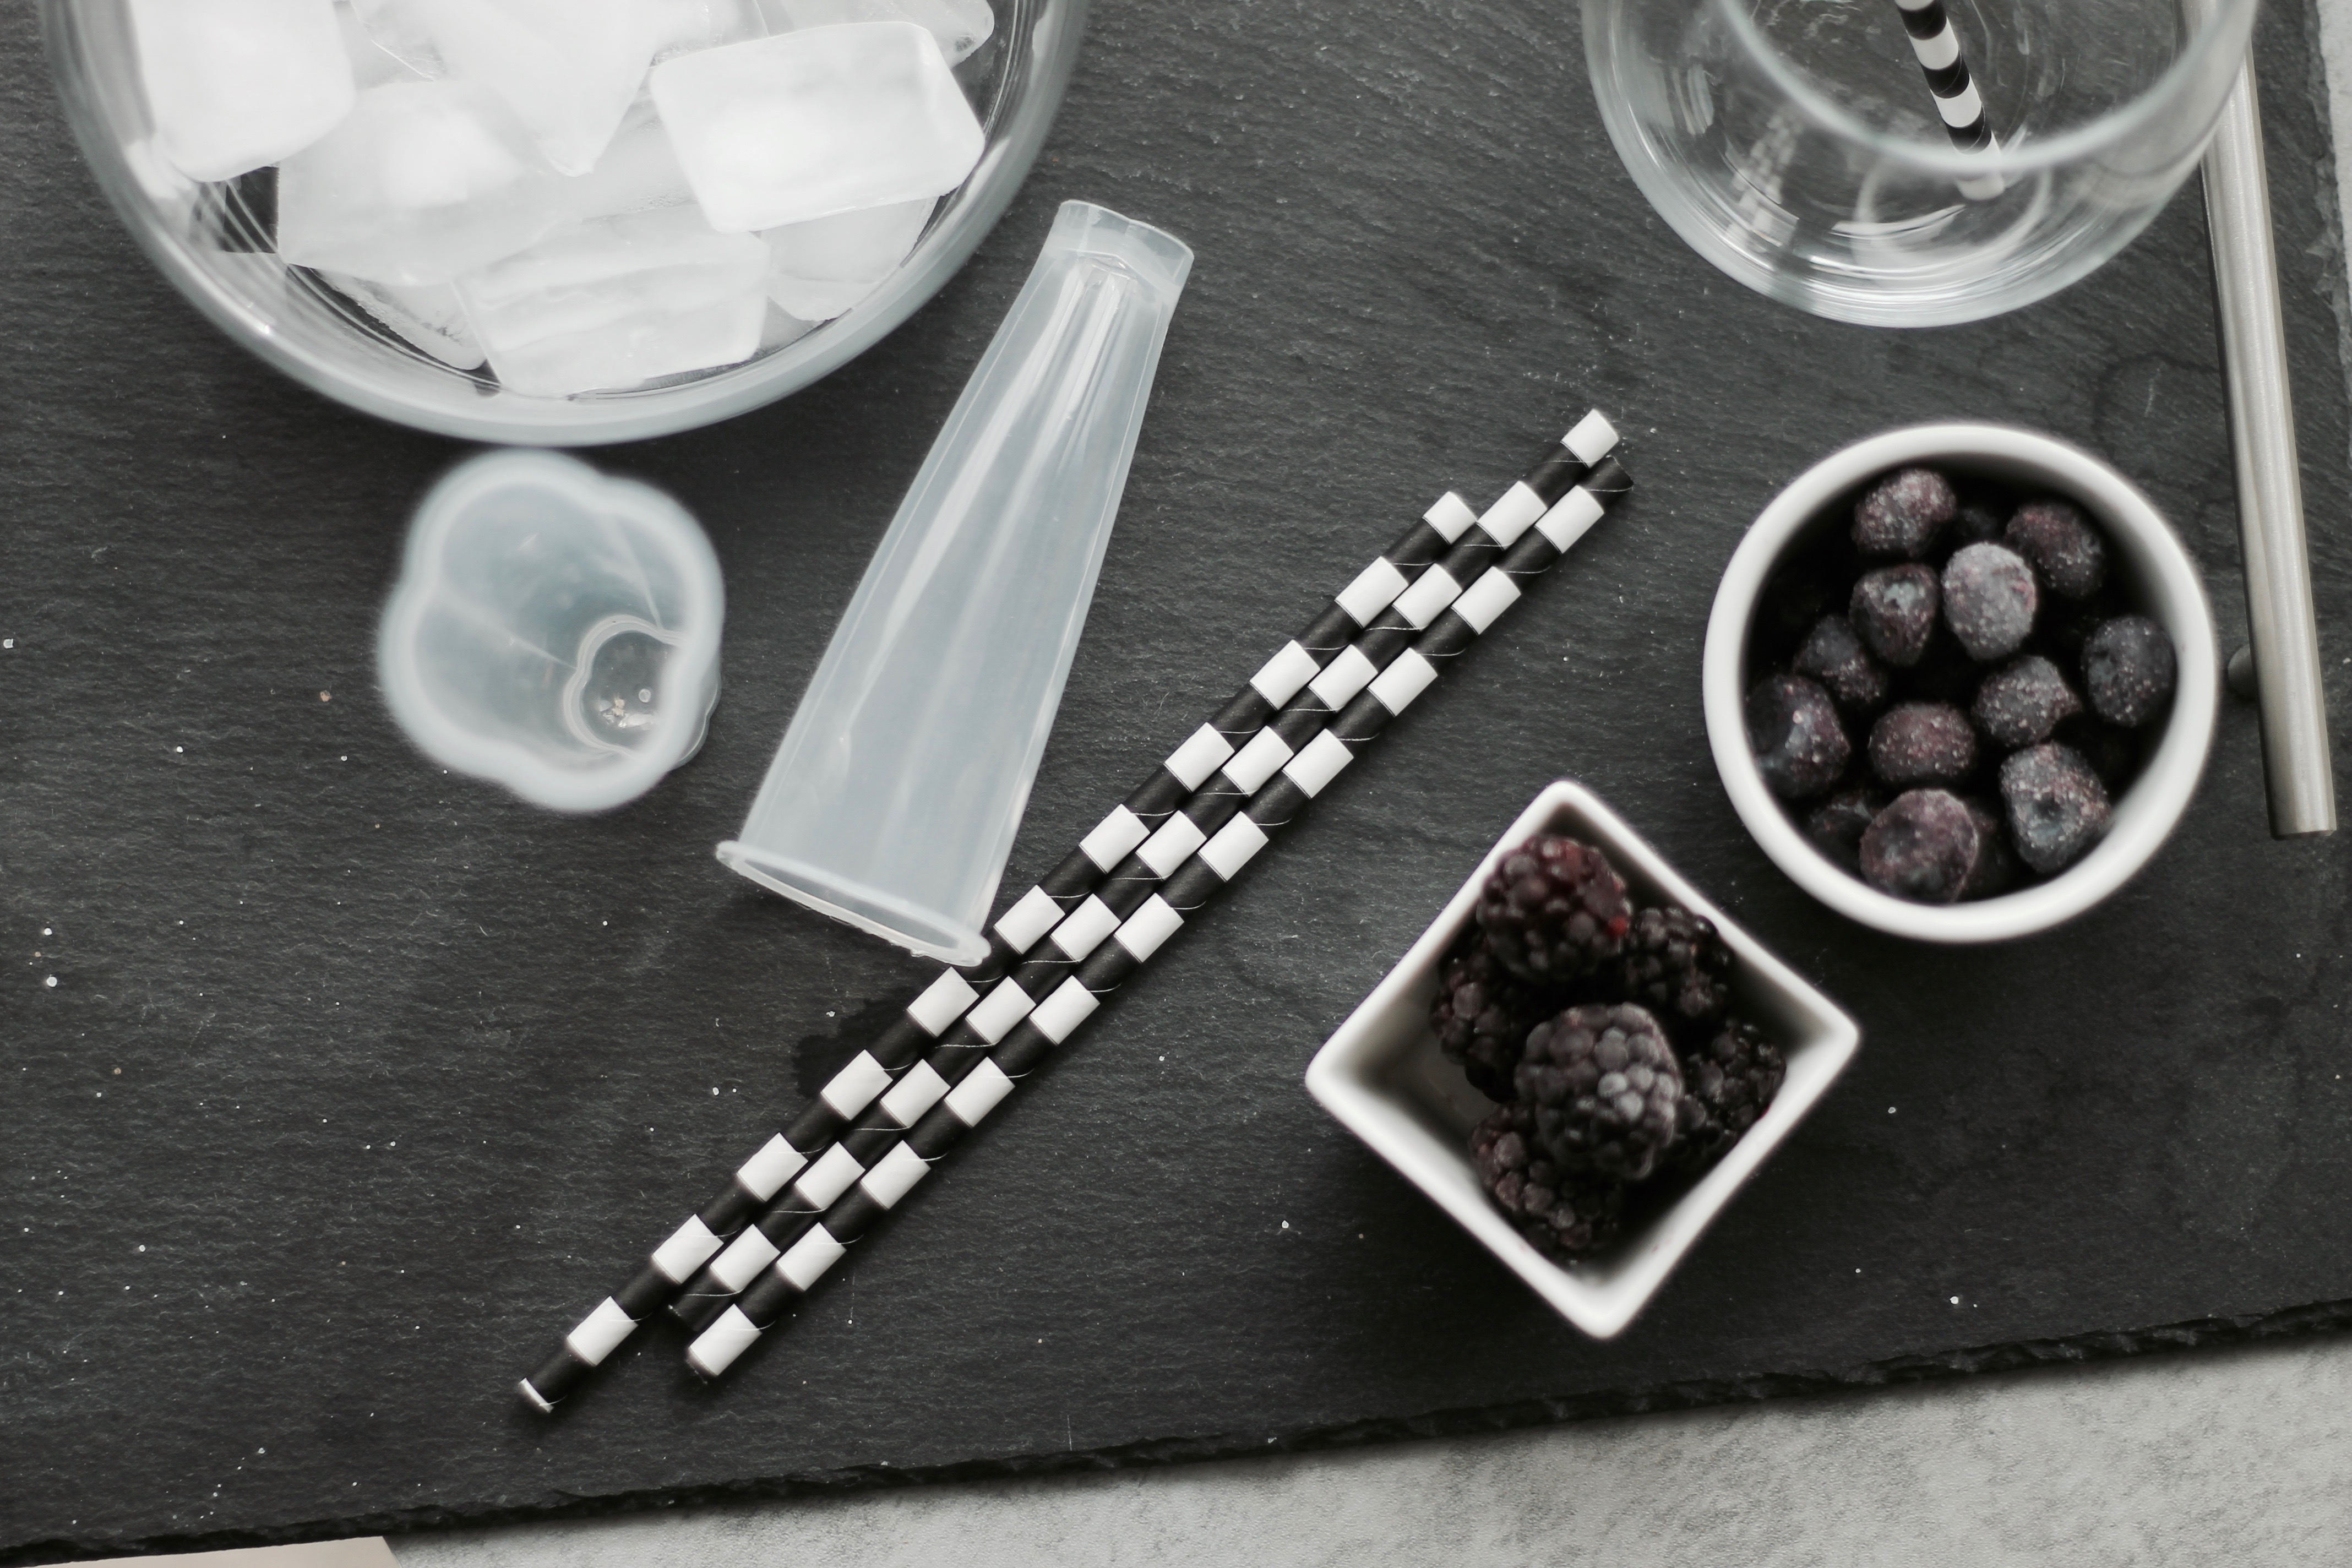 MON MODE Blog | Mon Mode | Fashion Blog | Toronto Blogger | Wine Cocktail | Raven Conspiracy | Wine Popsicle Cocktail